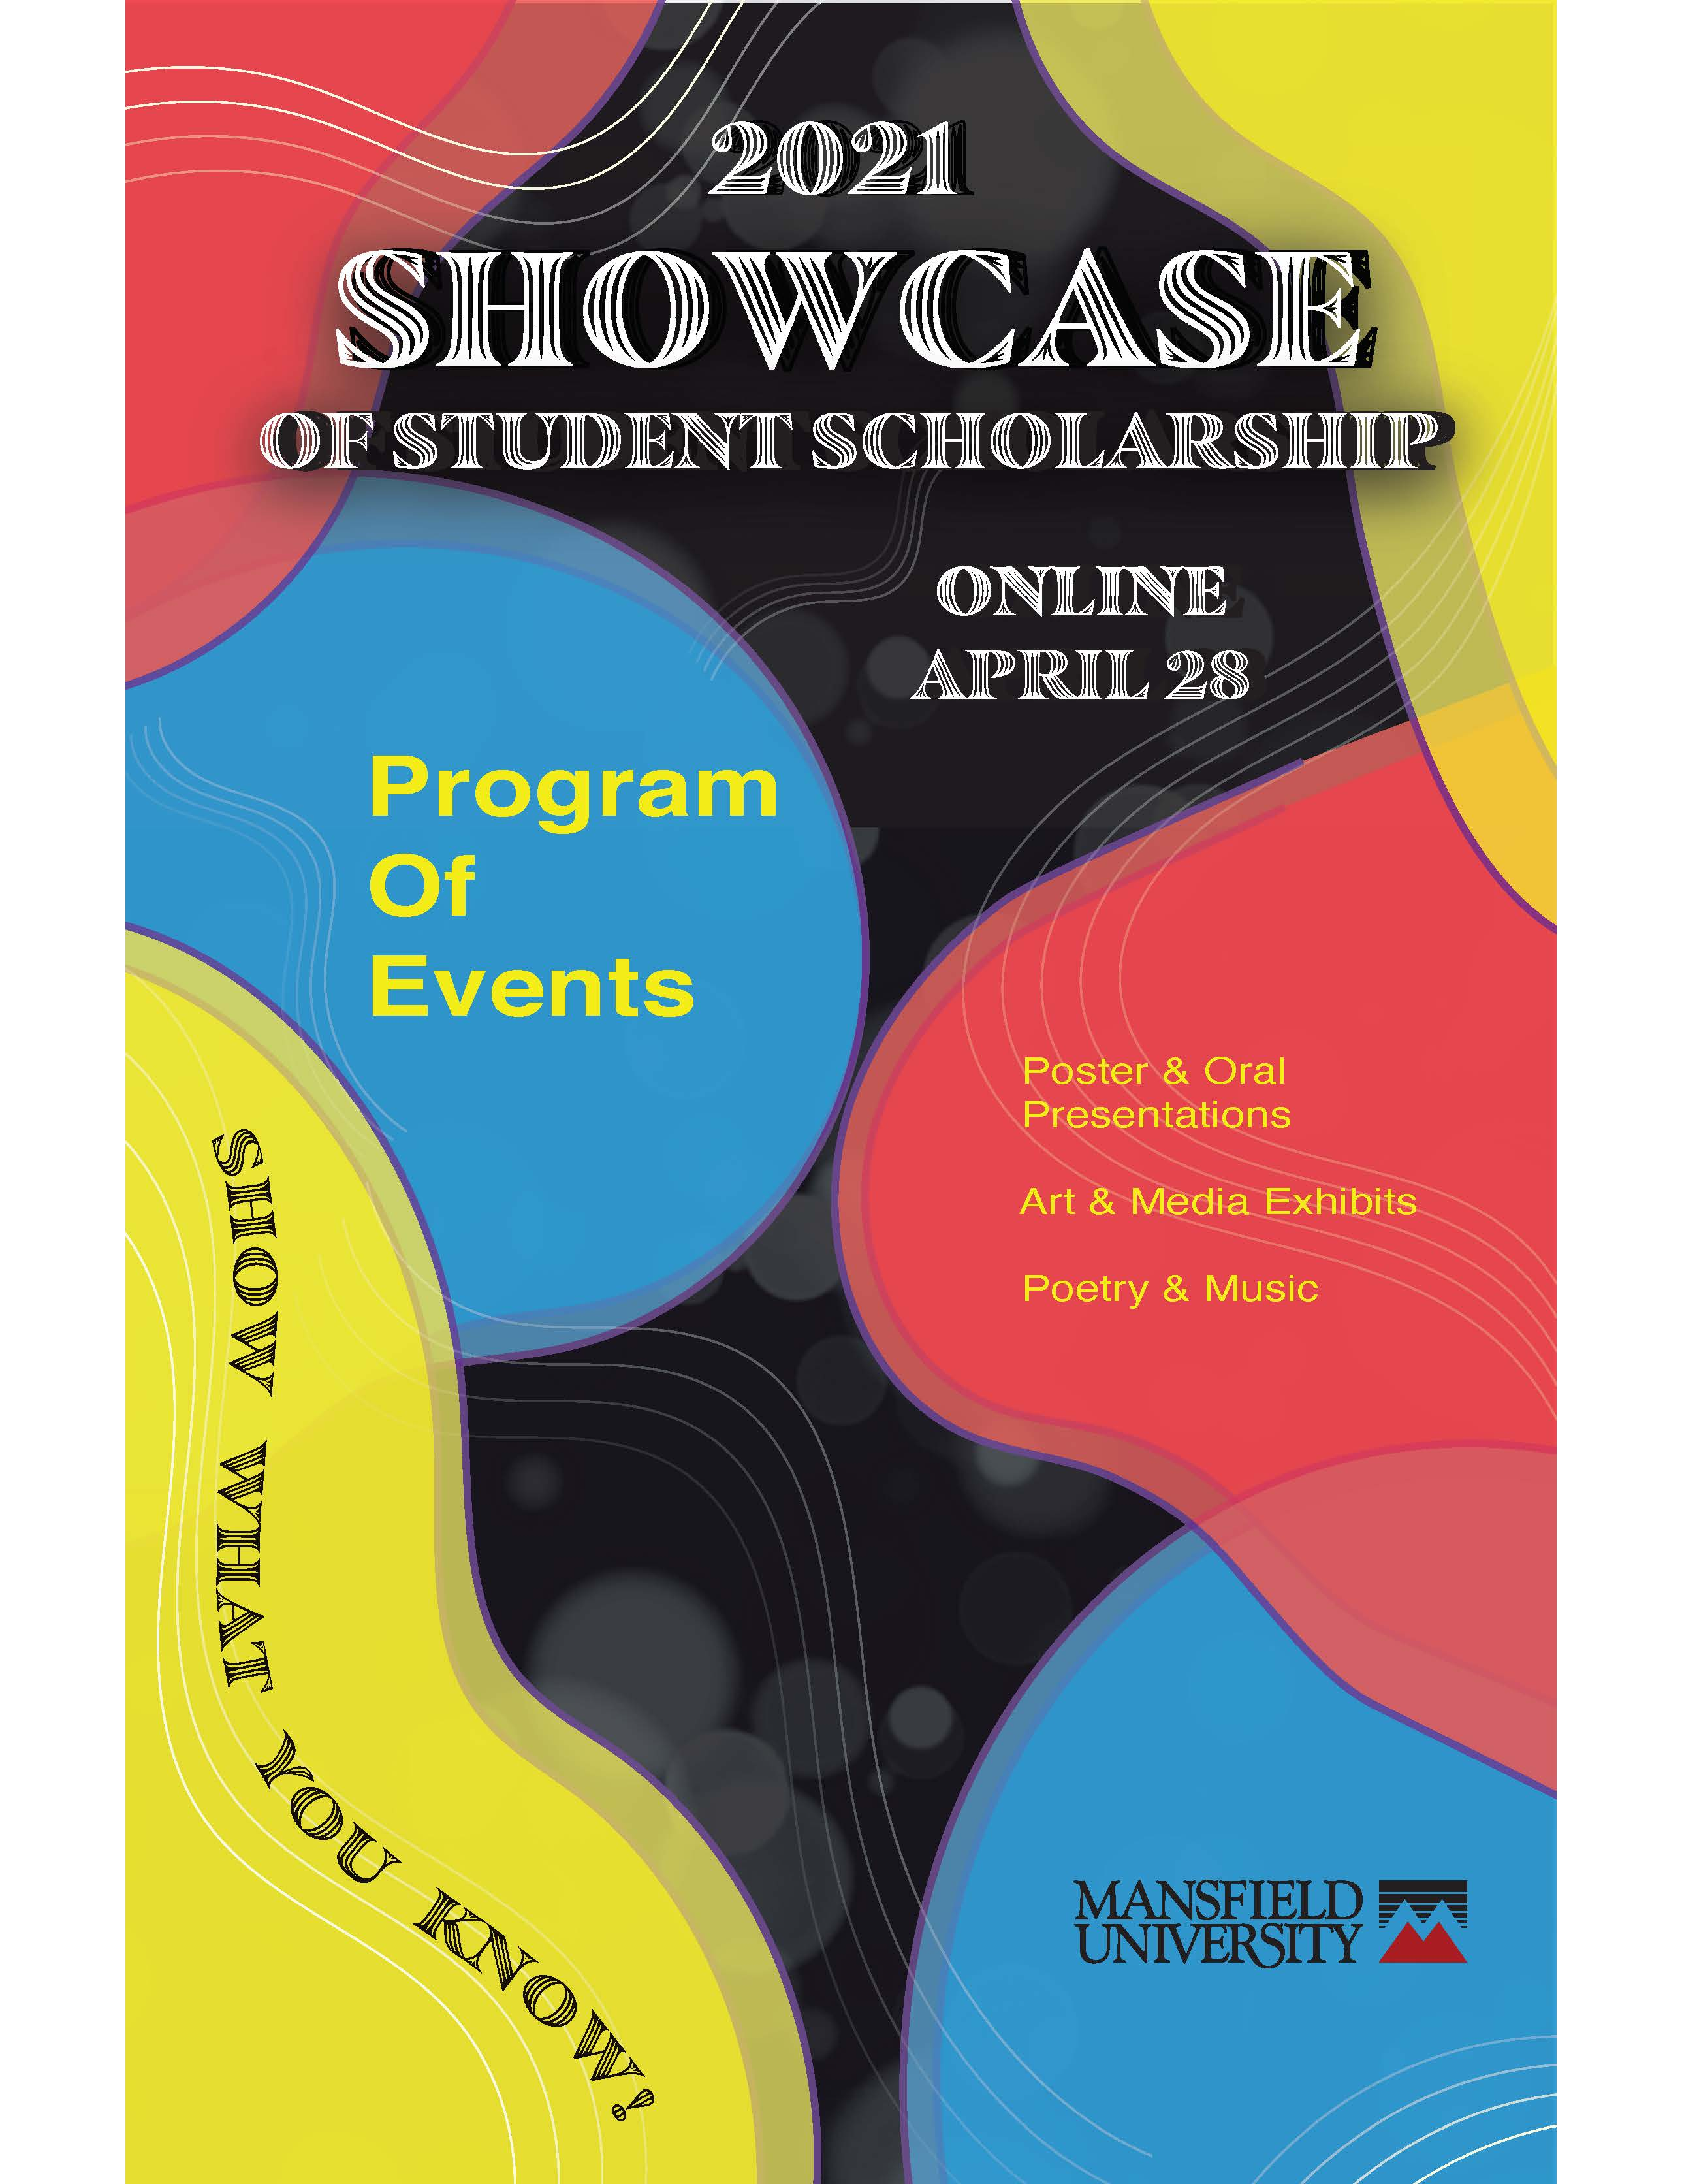 Showcase of Student Scholarship